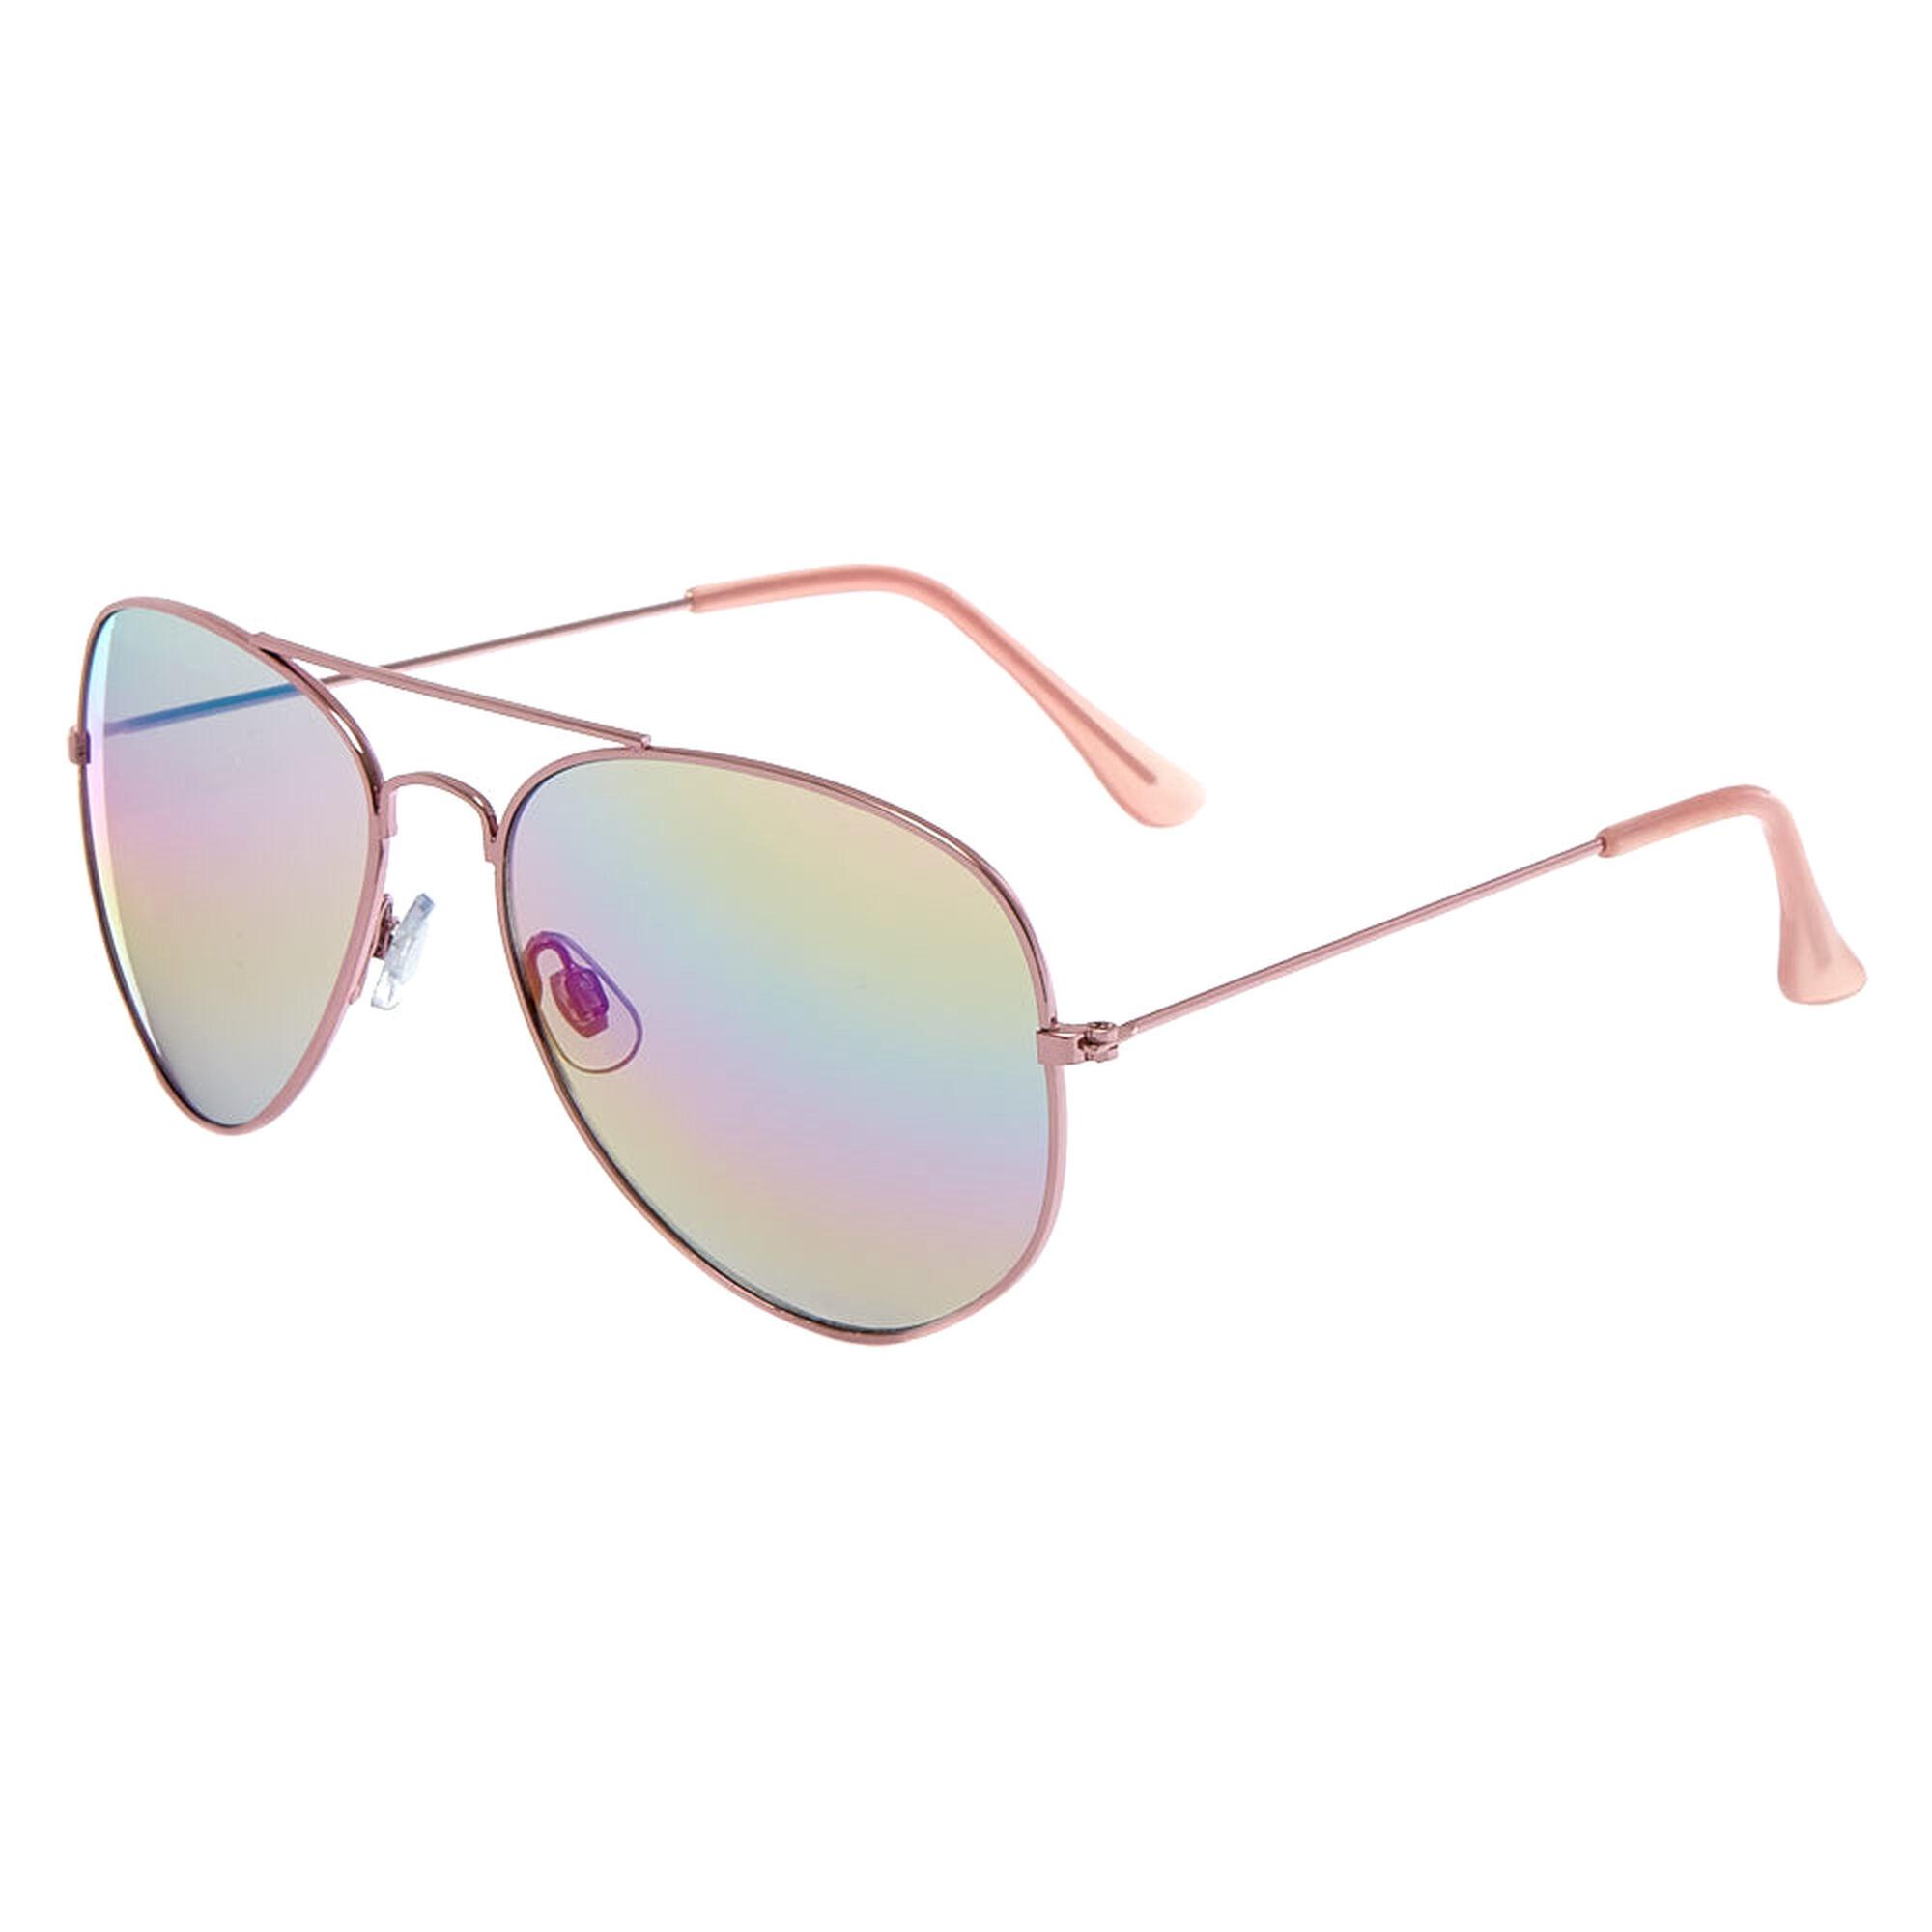 fe01fd8abca66 Pink Mirrored Aviator Sunglasses